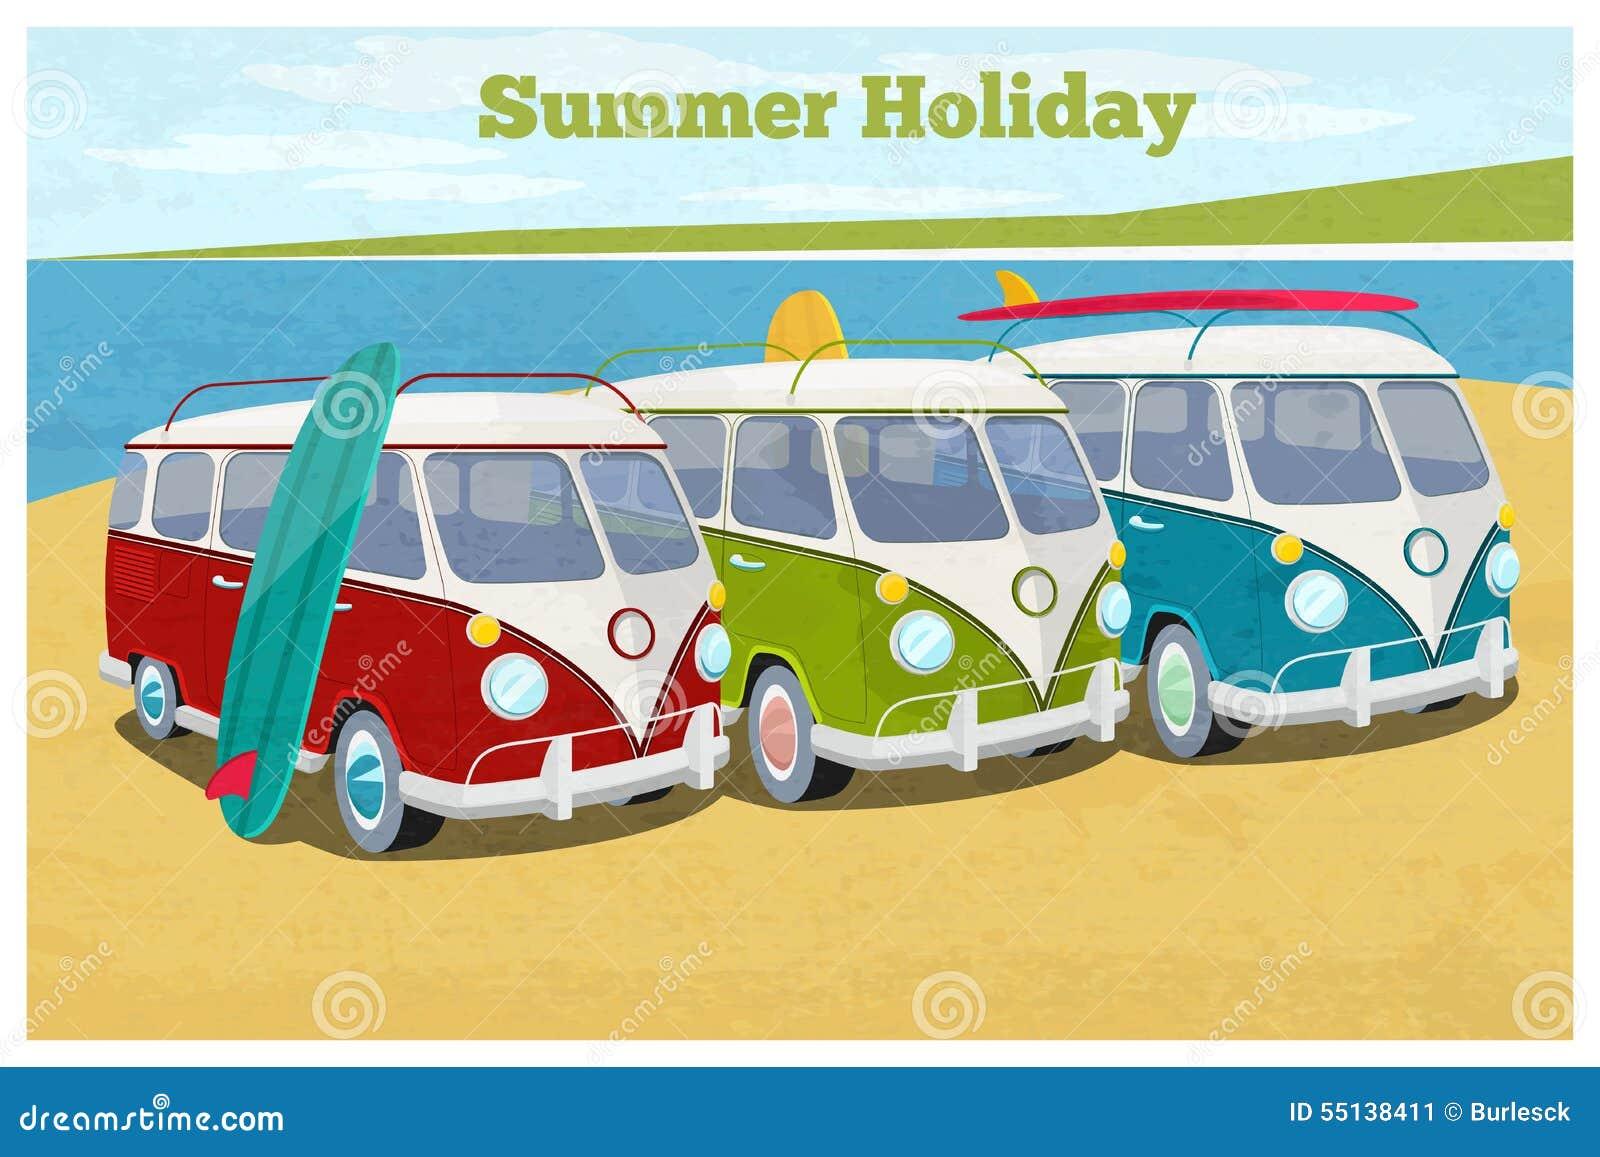 Summer Travel Design With Camper Van Transportation And Vacation Retro Bus Vector Illustration